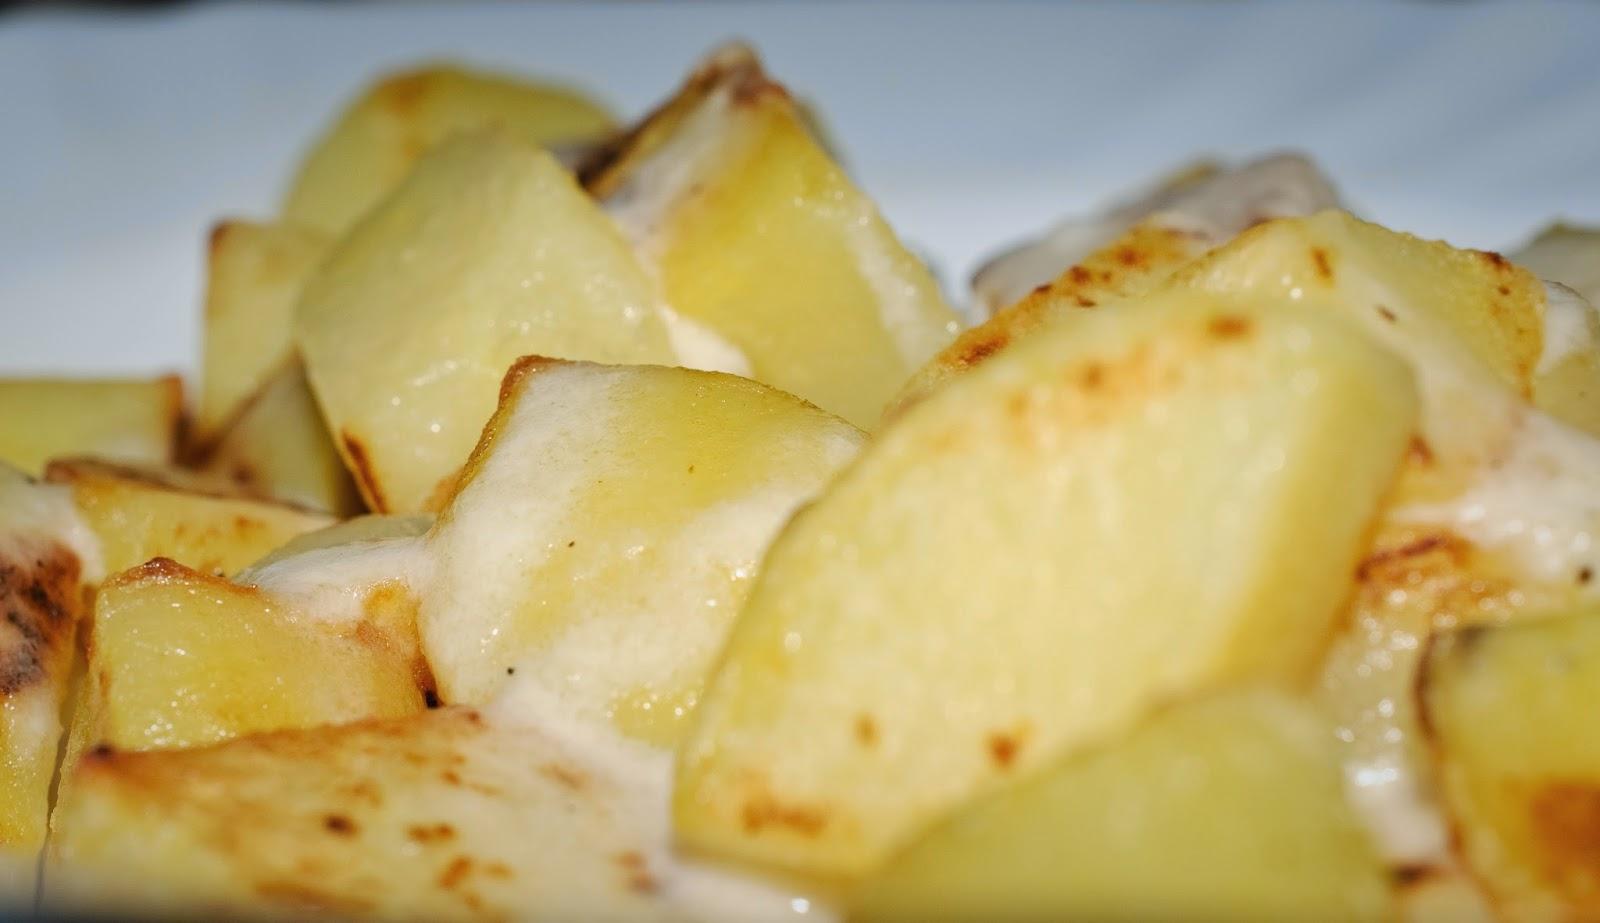 patatas al queso; cheesy potatoes